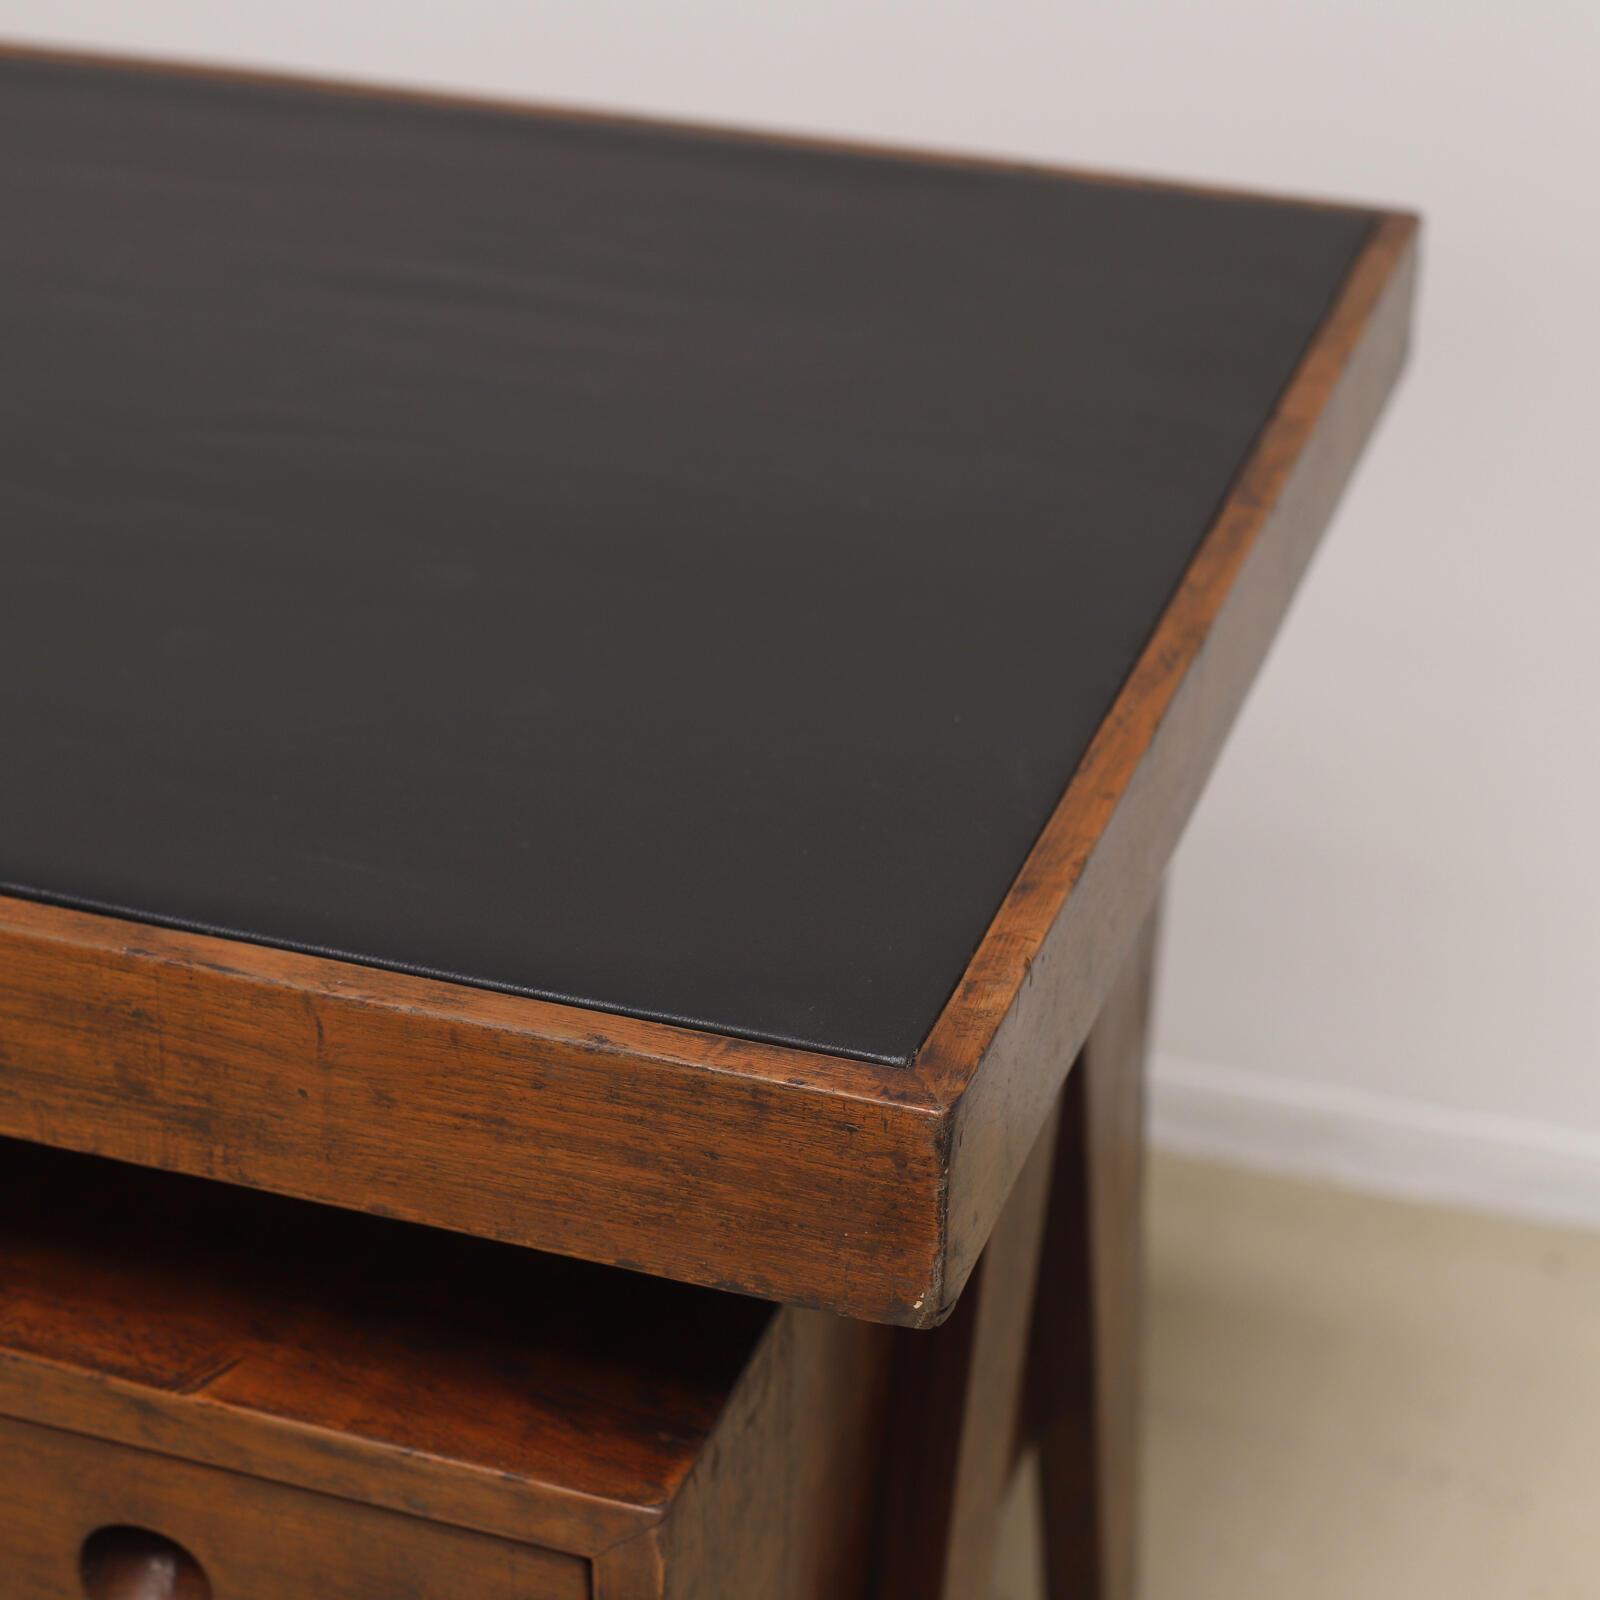 pierre jeanneret ジャンヌレ デスク テーブル